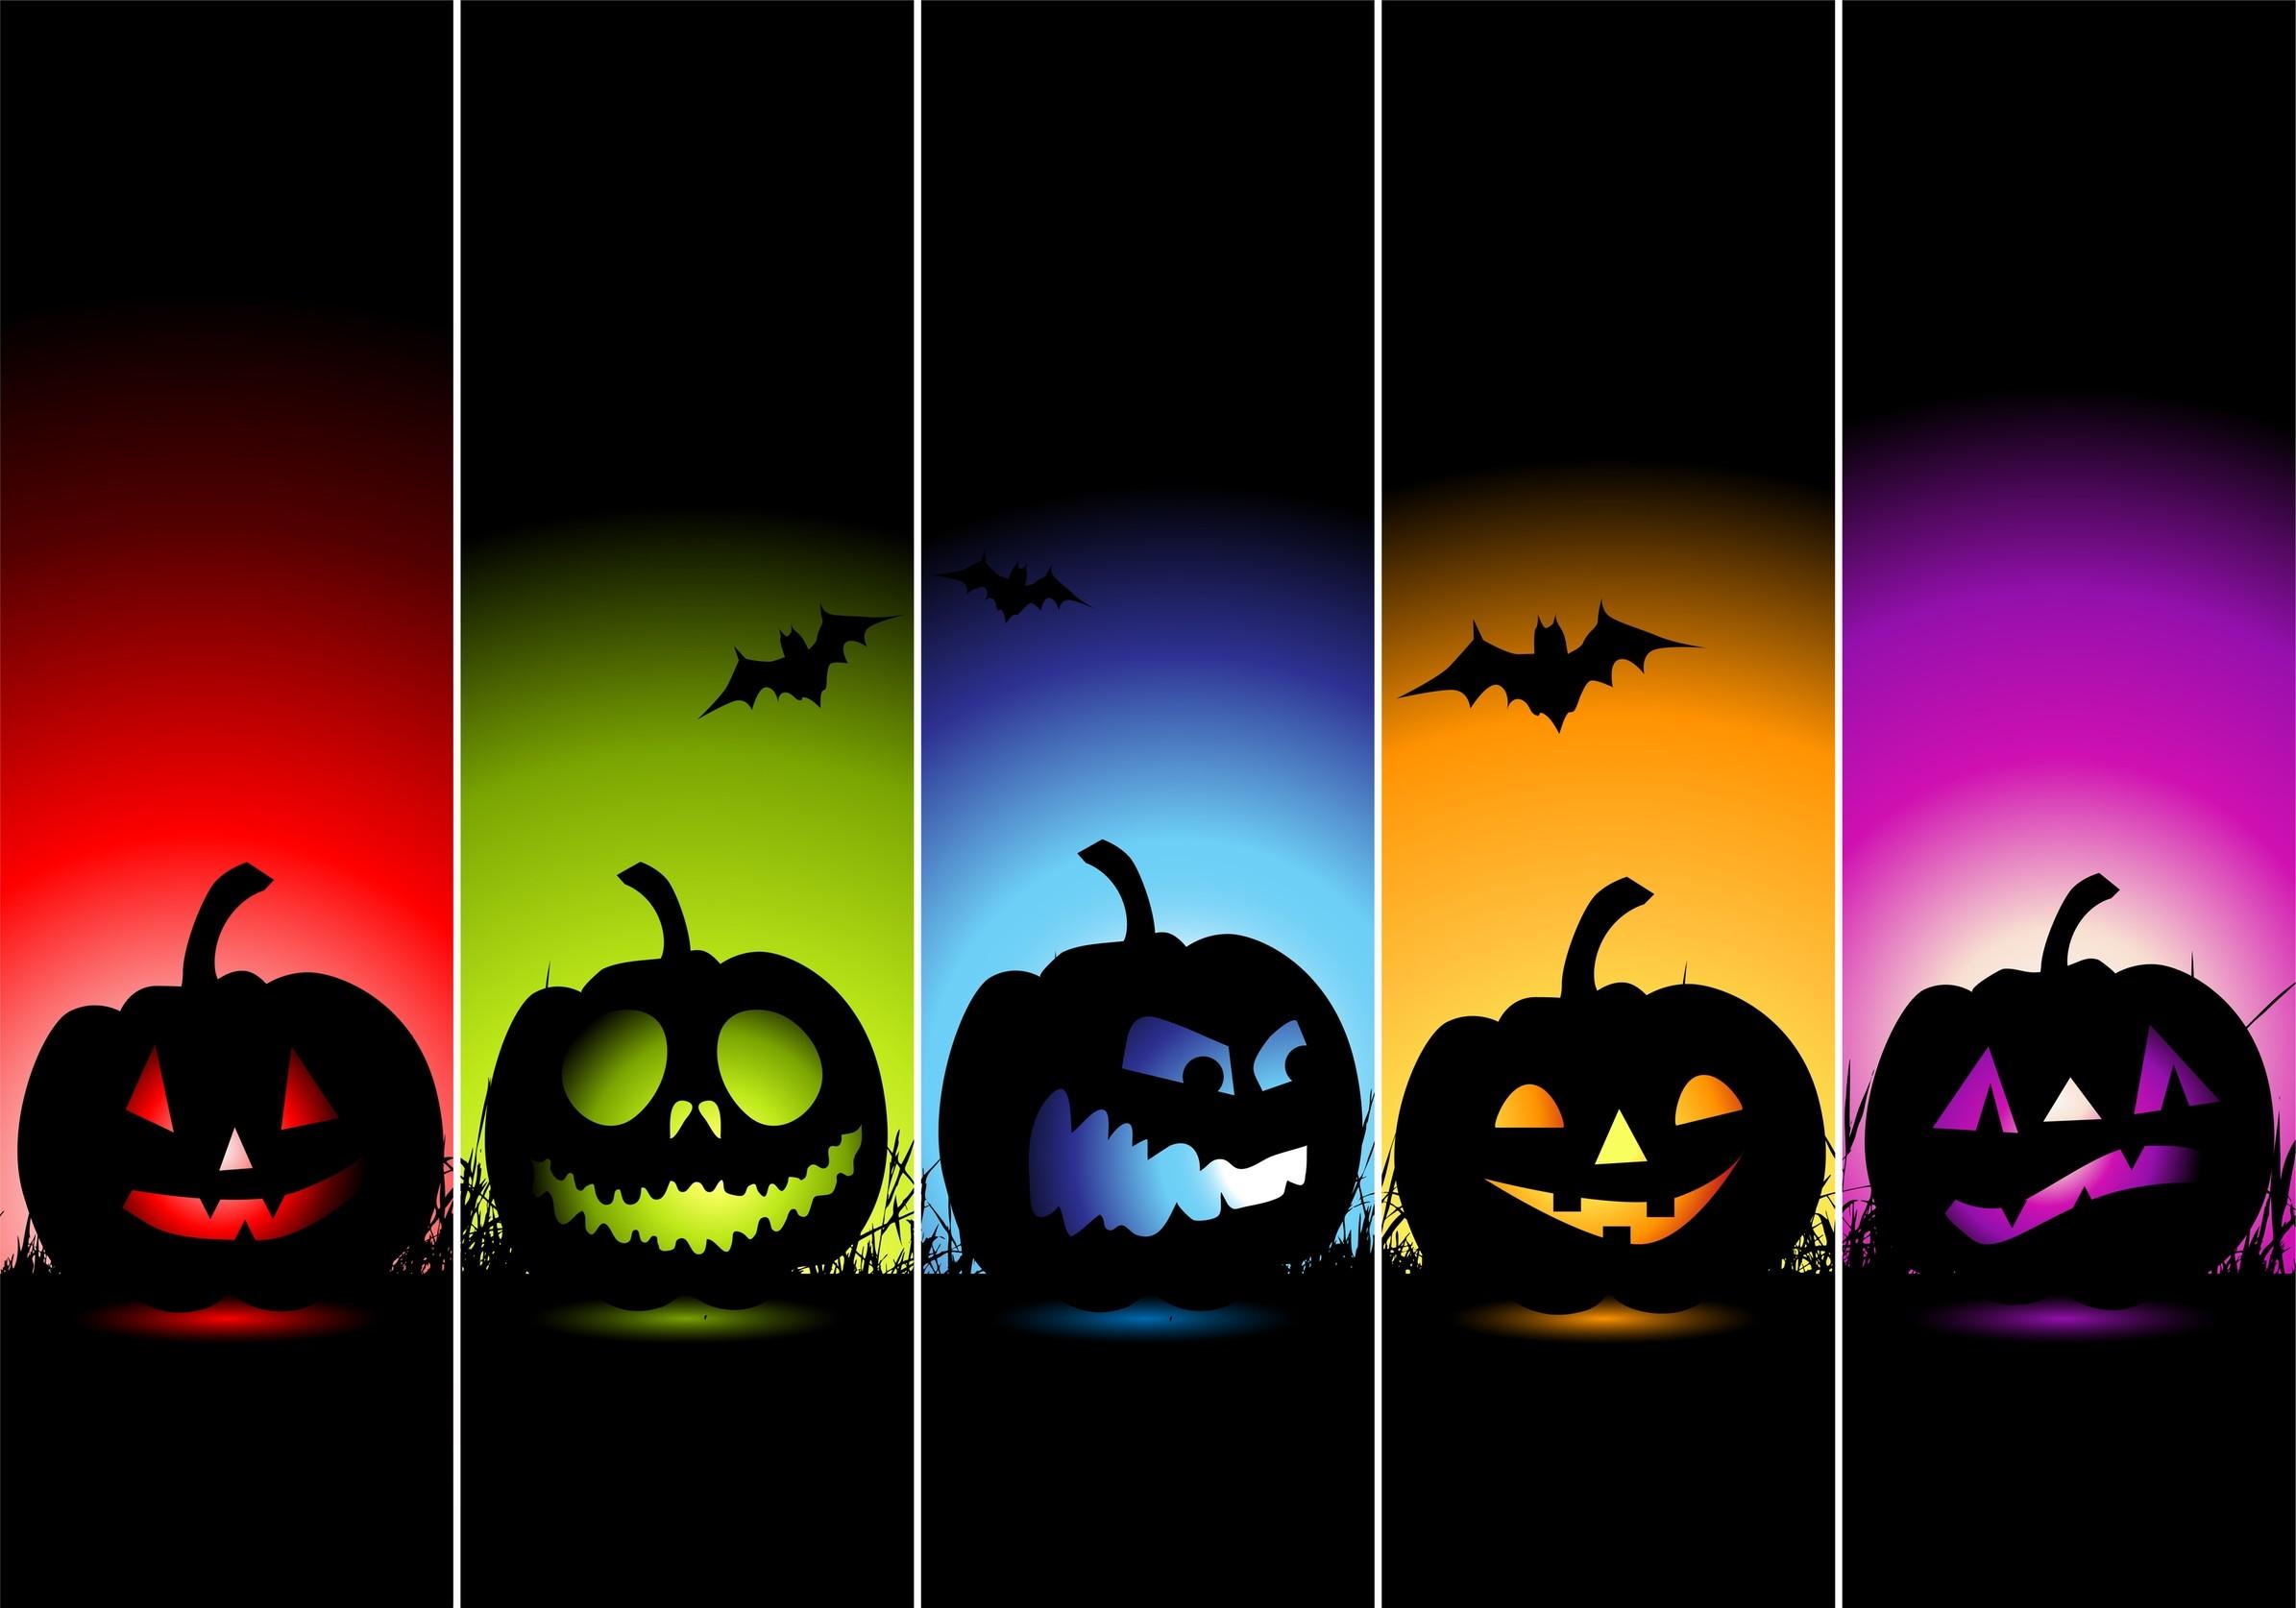 Best Wallpaper Halloween Windows 10 - 932282-halloween-wallpaper-backgrounds-2390x1674-windows-10  Picture_19249.jpg